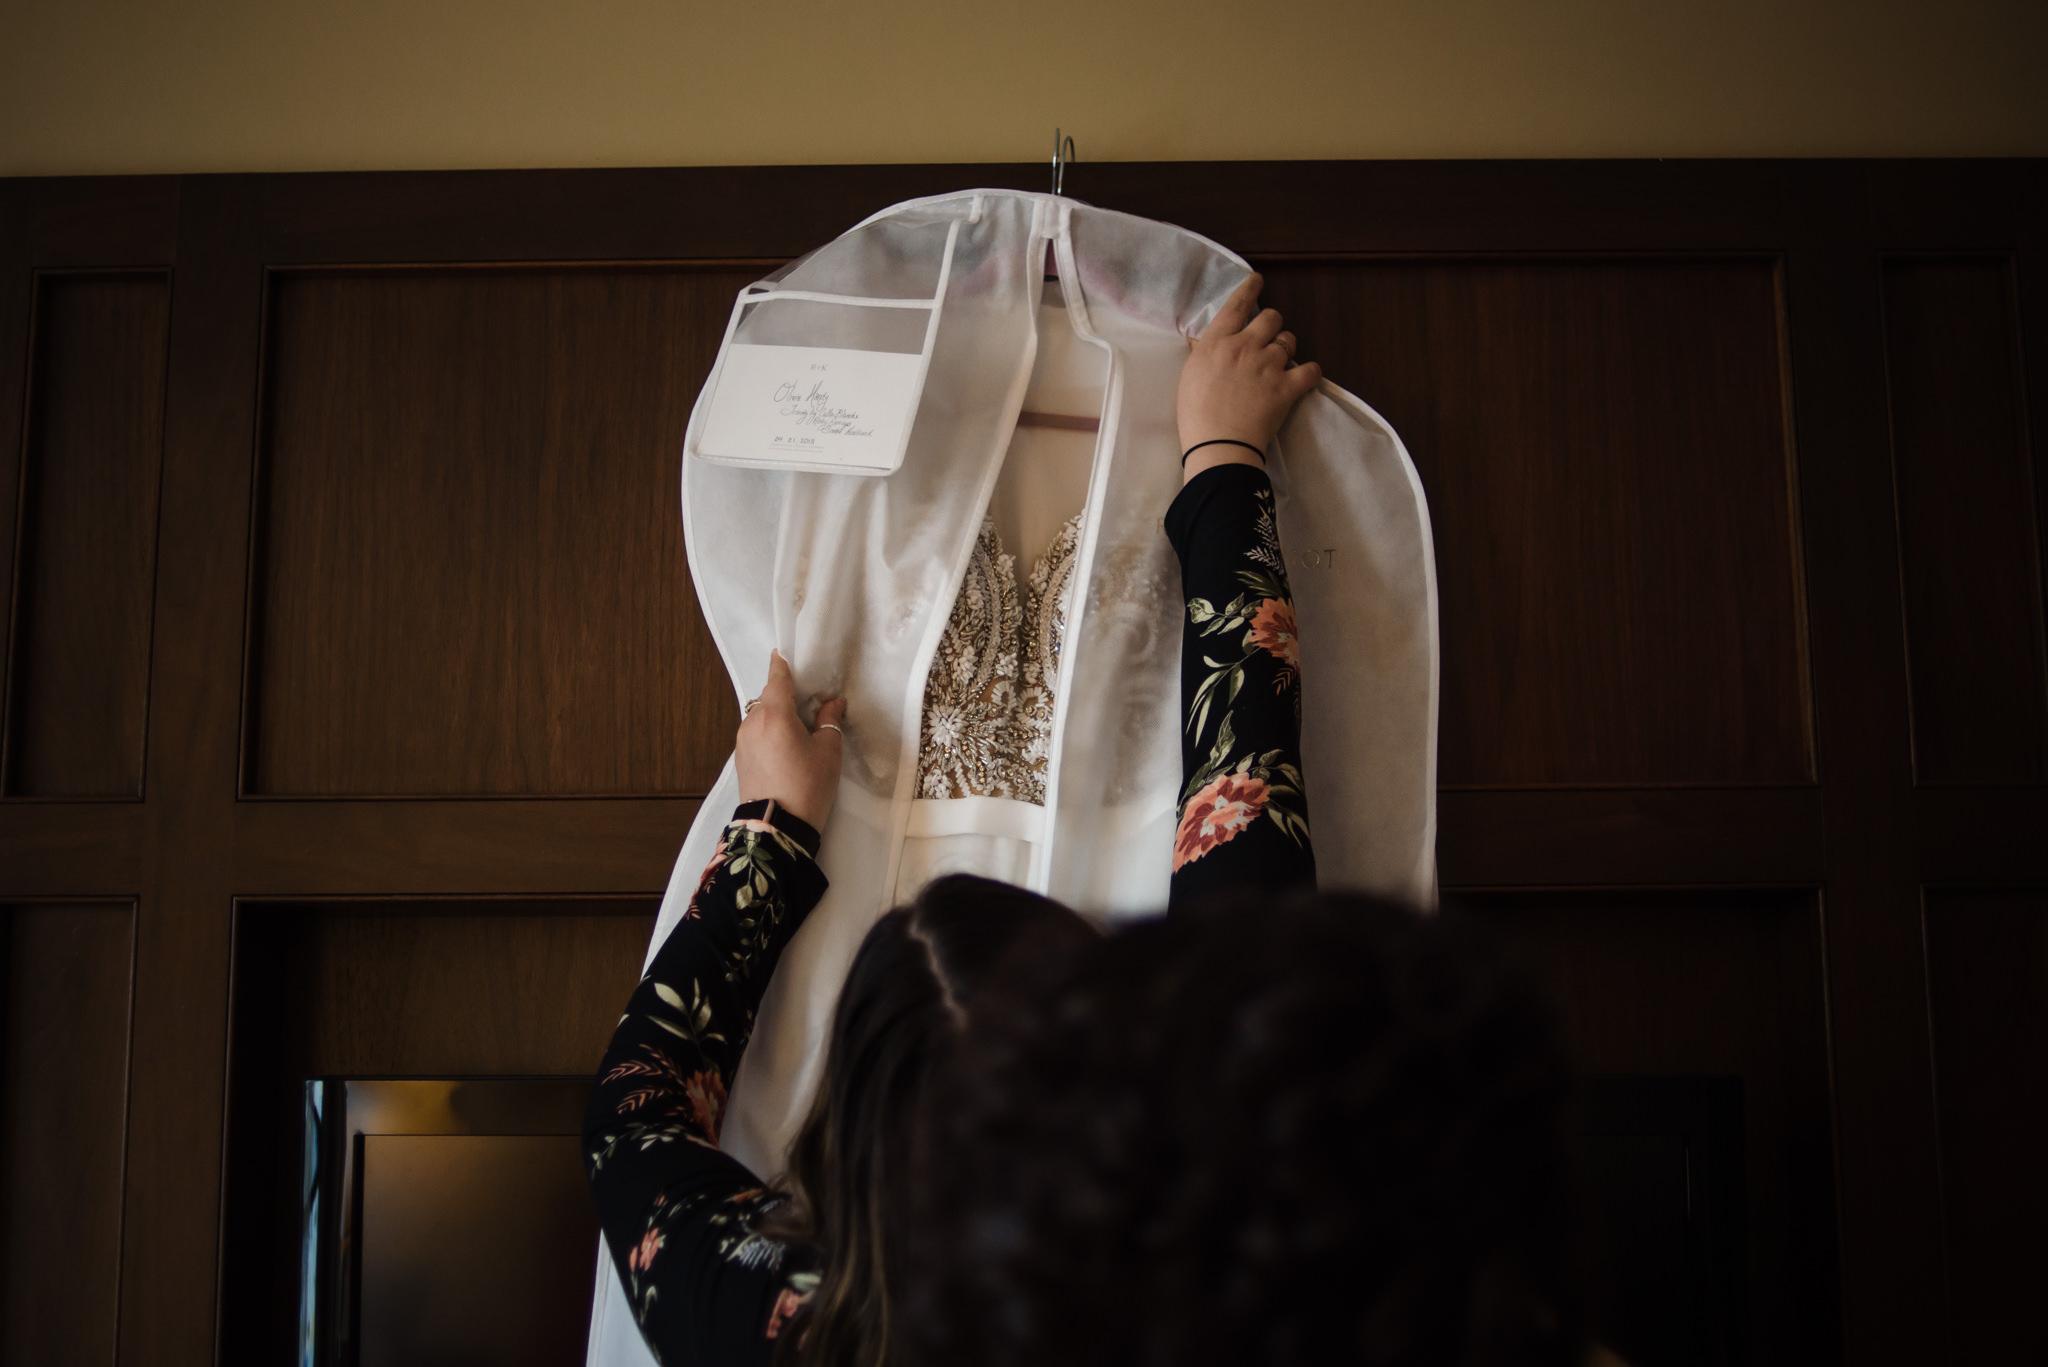 HILTON-OMAHA-WEDDING-PHOTOGRAPHER-JM-STUDIOS-OMAHA-LIV-BRICE-007.jpg